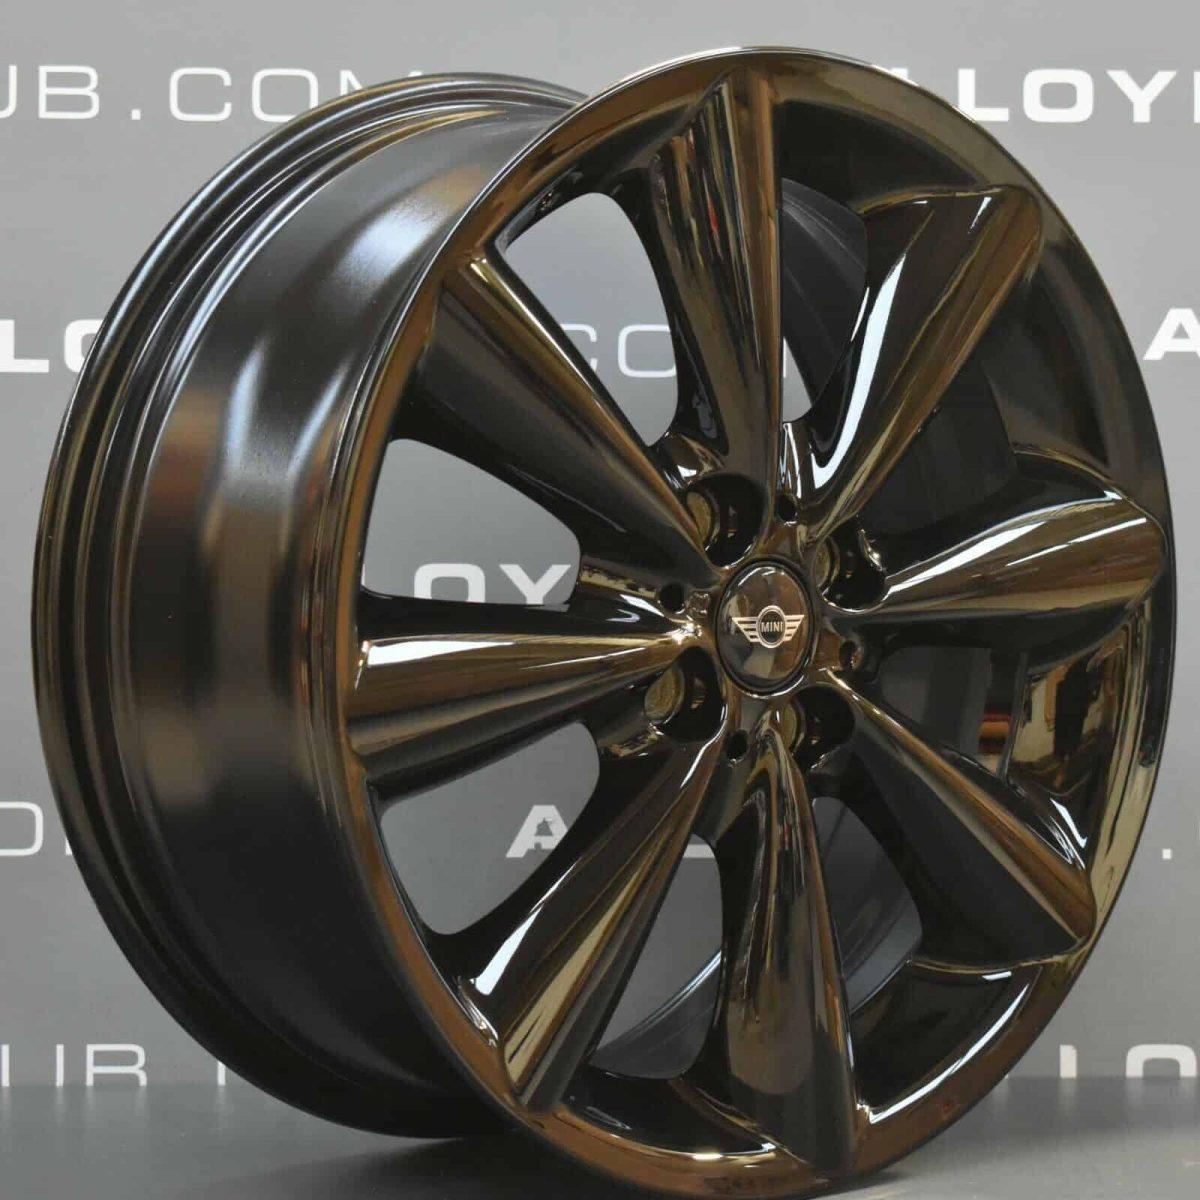 "Genuine Mini Cooper S R50 R53 R56 R121 Conical Spoke 17"" inch Alloy Wheels with Gloss Black Finish 36116791931"